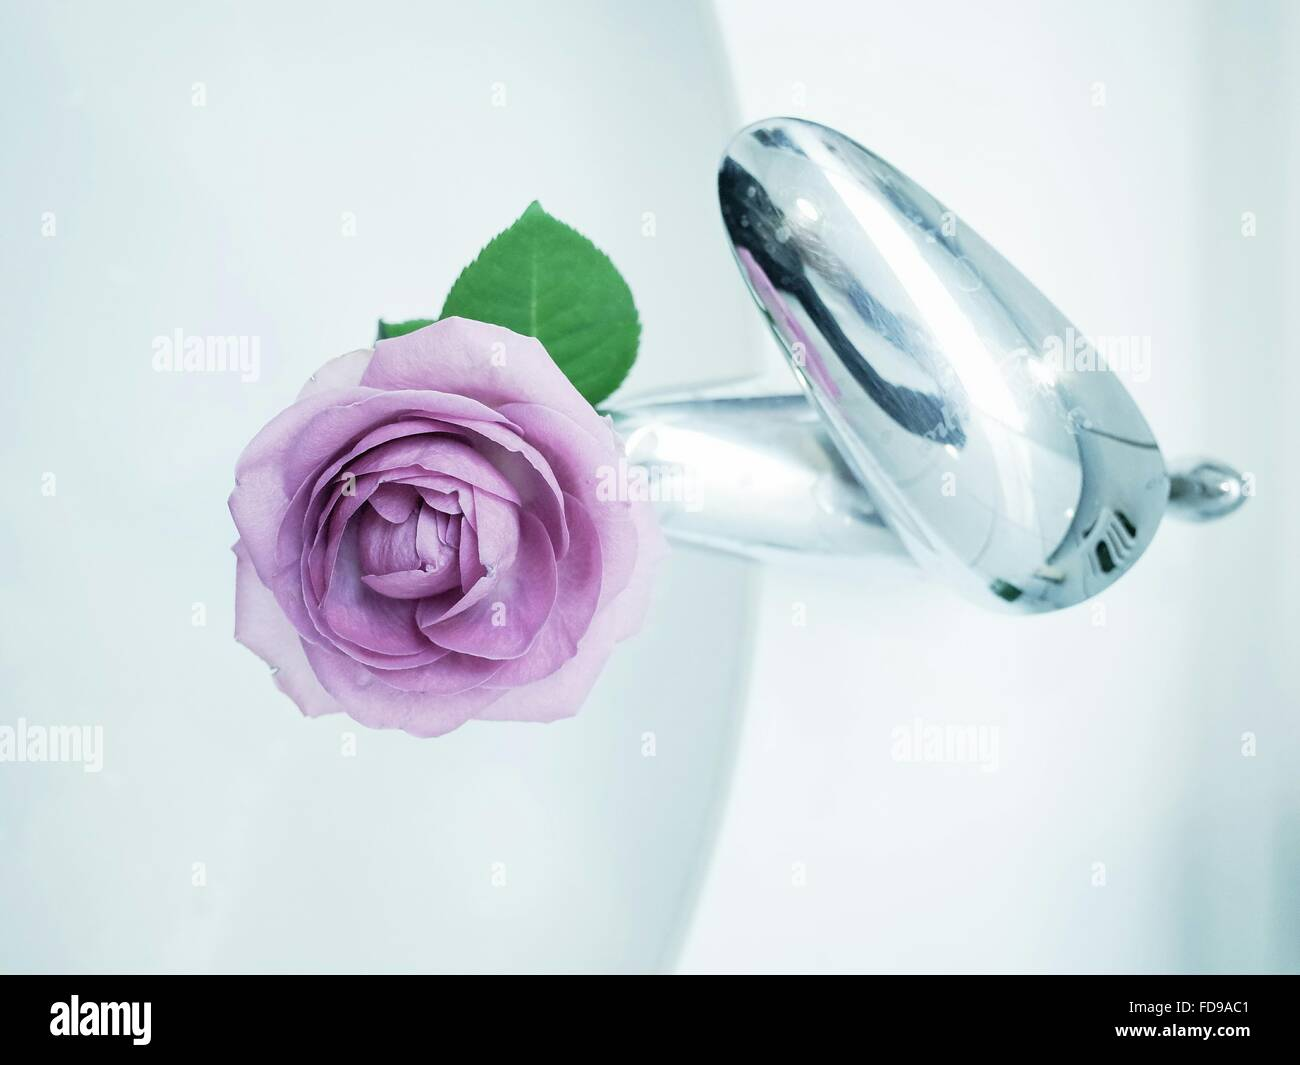 Directamente encima de tiro de rosa púrpura en el grifo Imagen De Stock